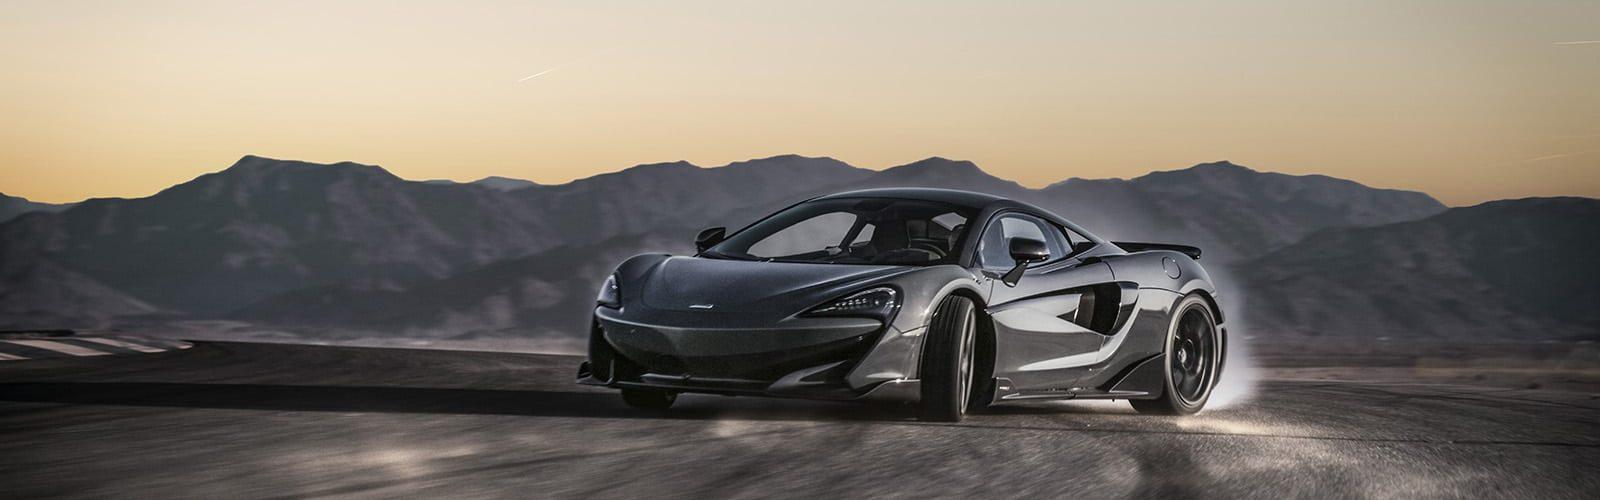 McLaren Segera Meluncurkan McLaren 600 LT